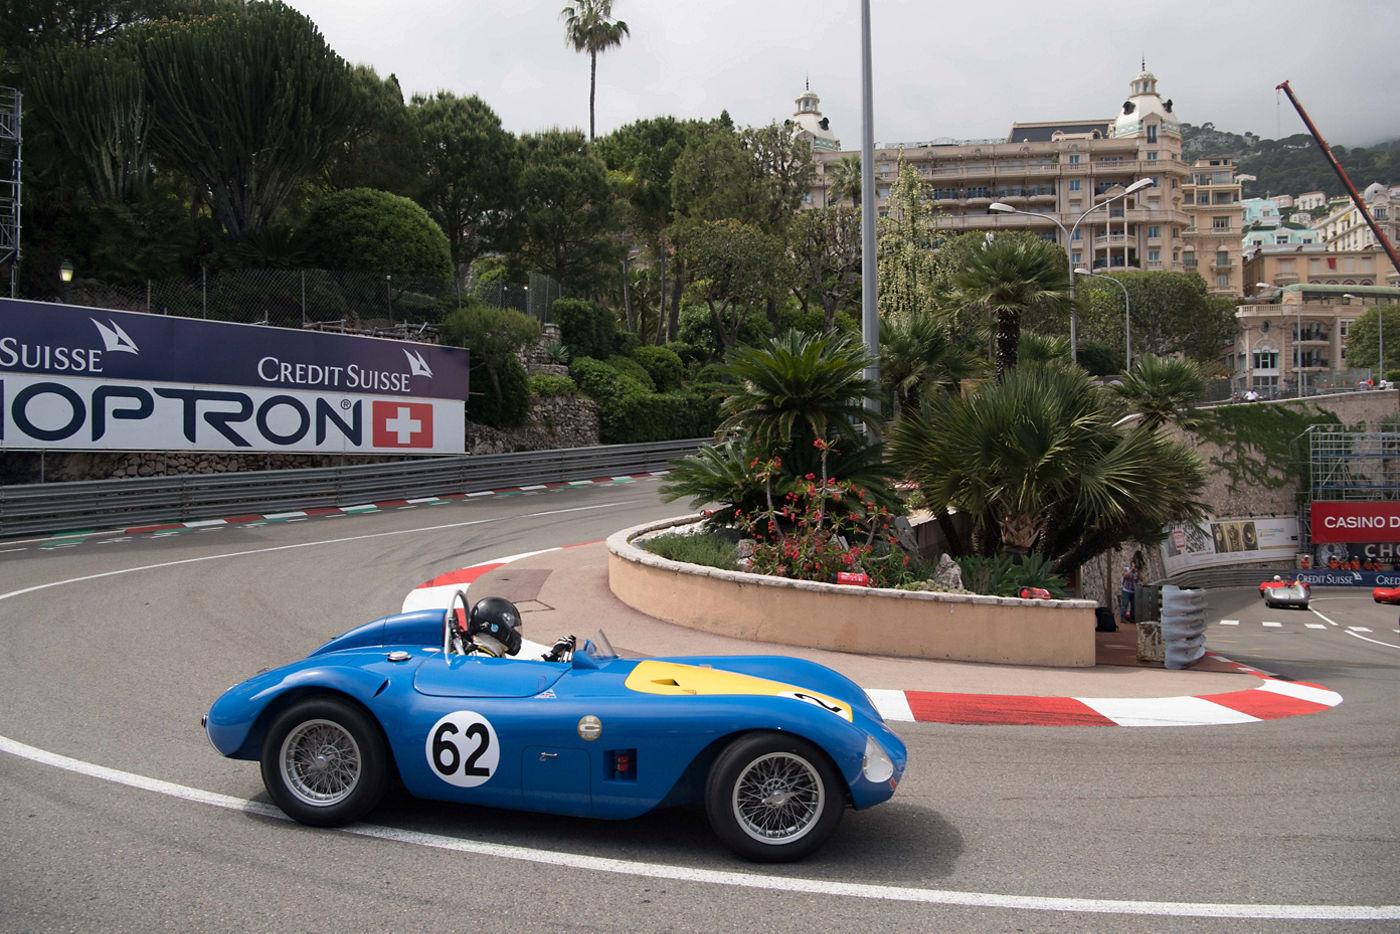 Grand Prix de Monaco Historique 2018 - Maserati A6GCS